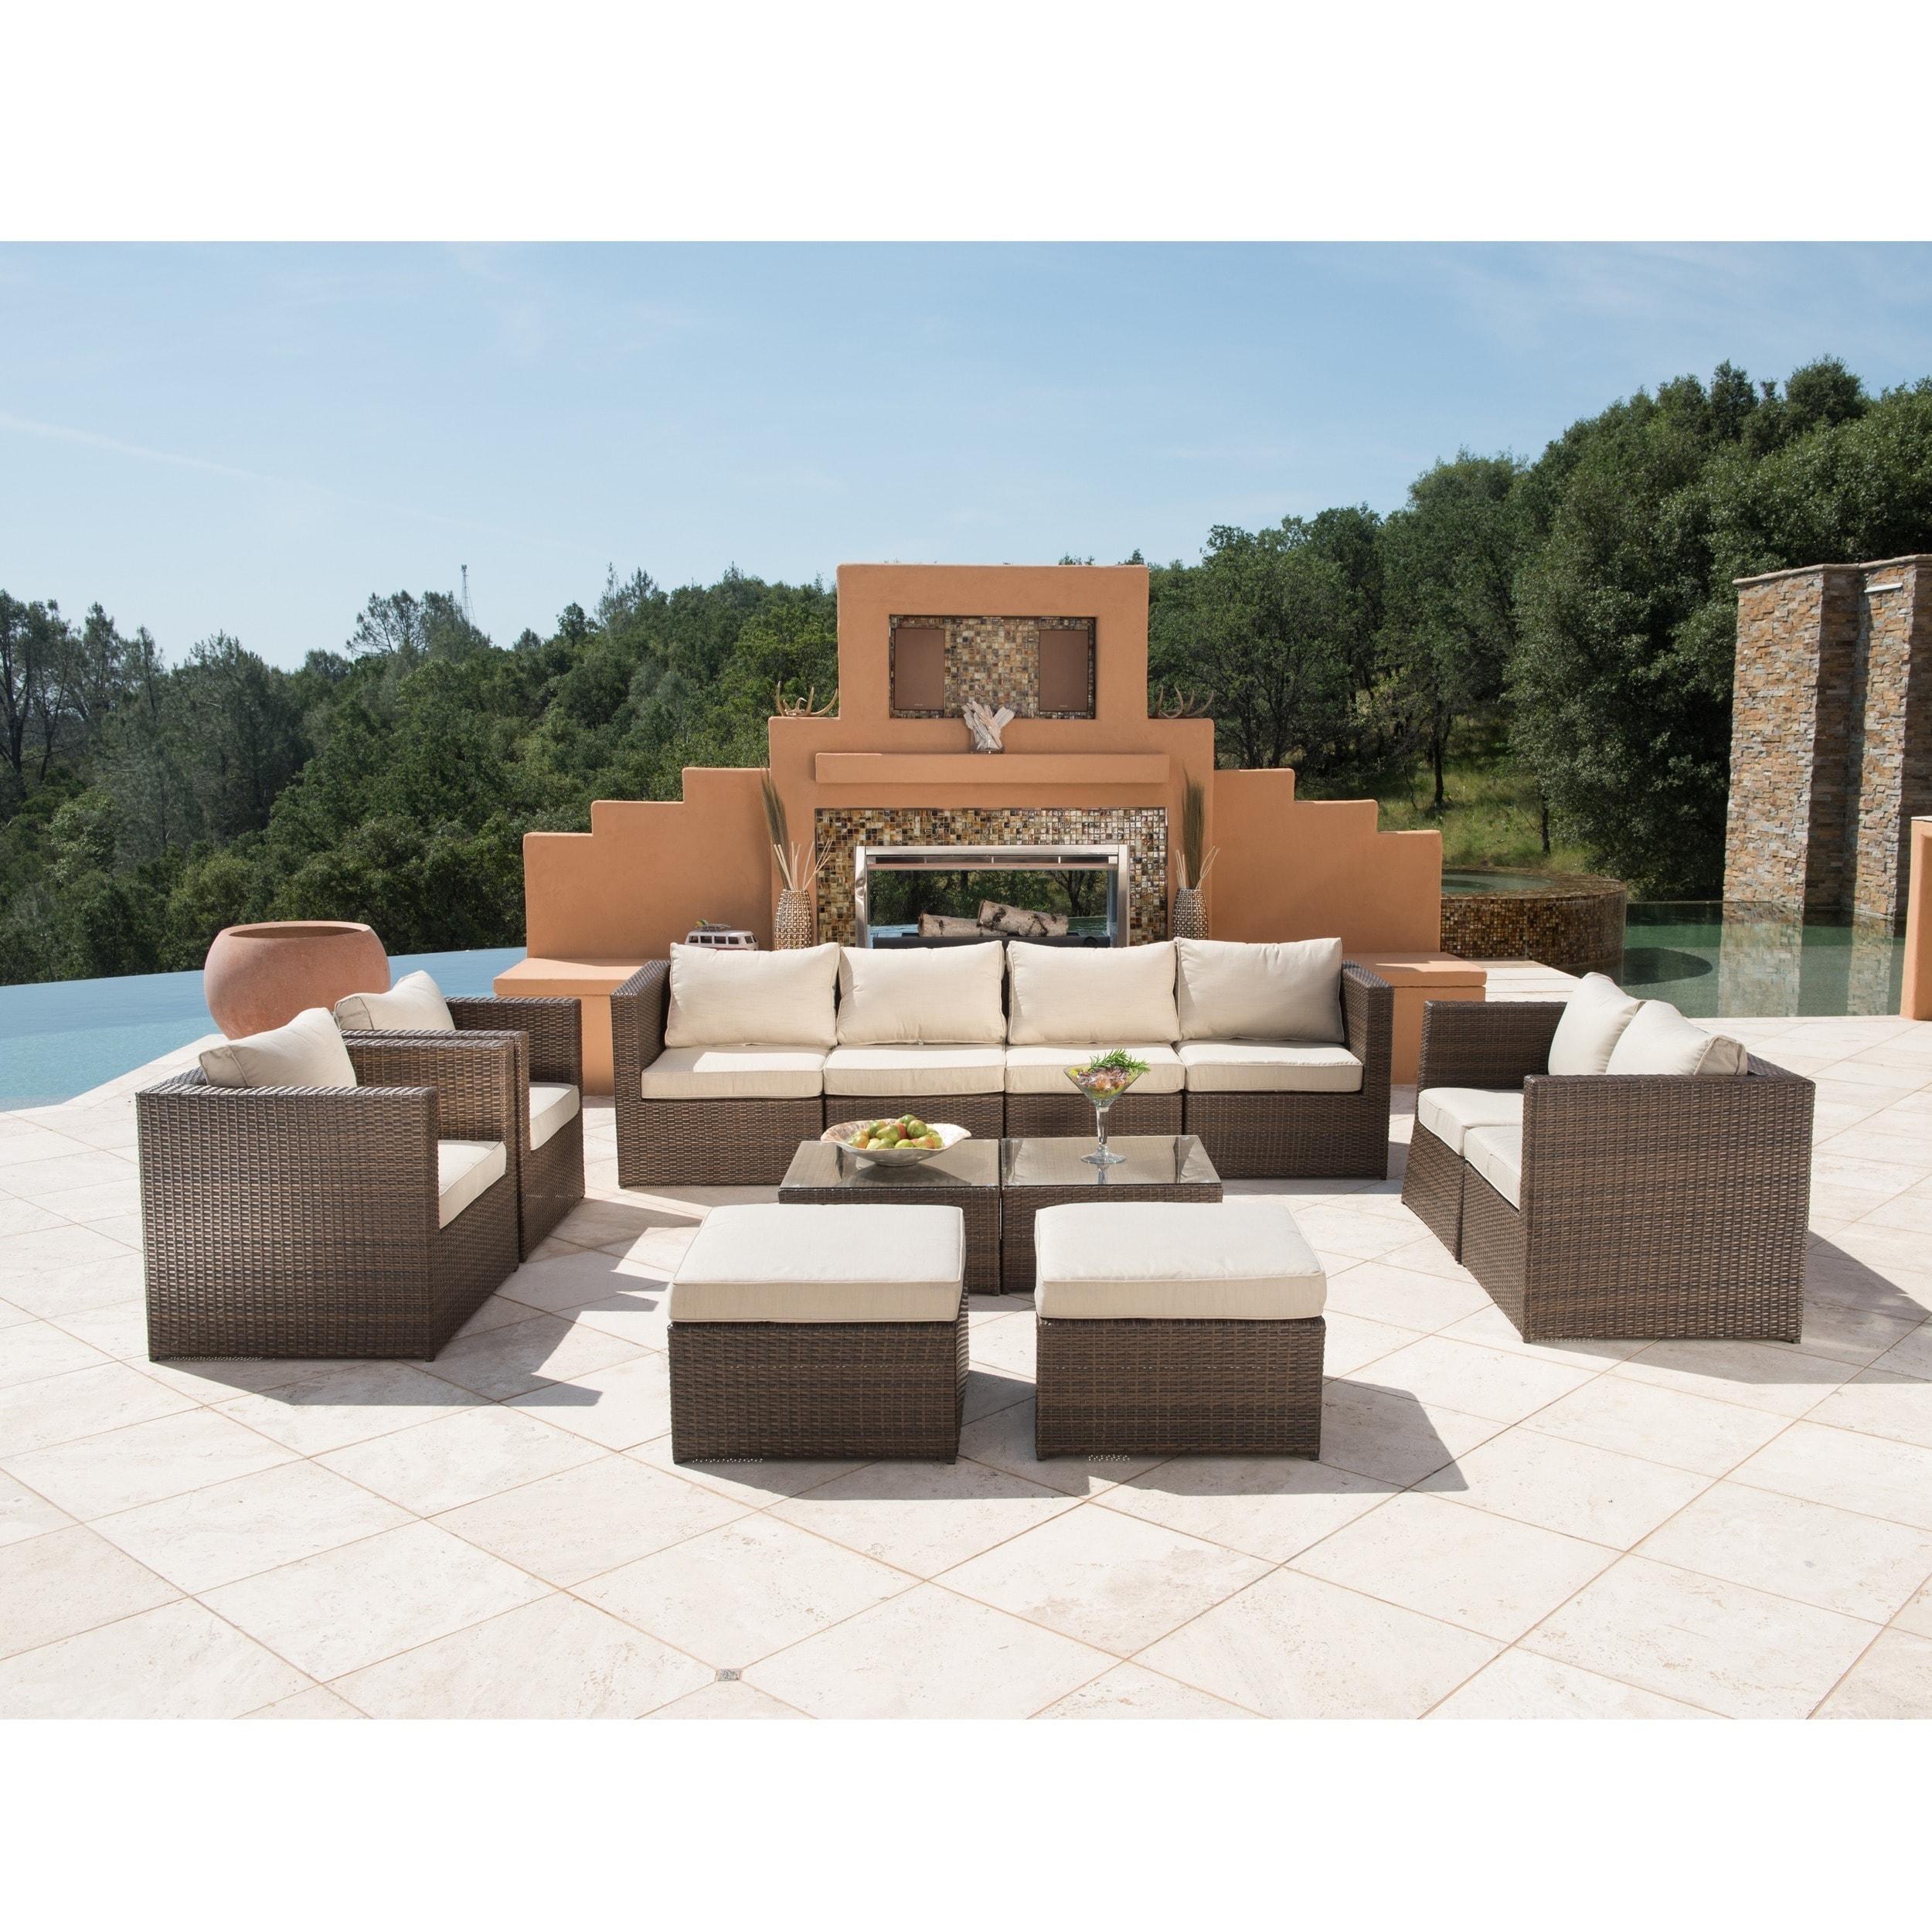 Corvus Trey 12 Piece Dark Brown Wicker Patio Furniture Set With Gl Top Free Shipping Today 11047230